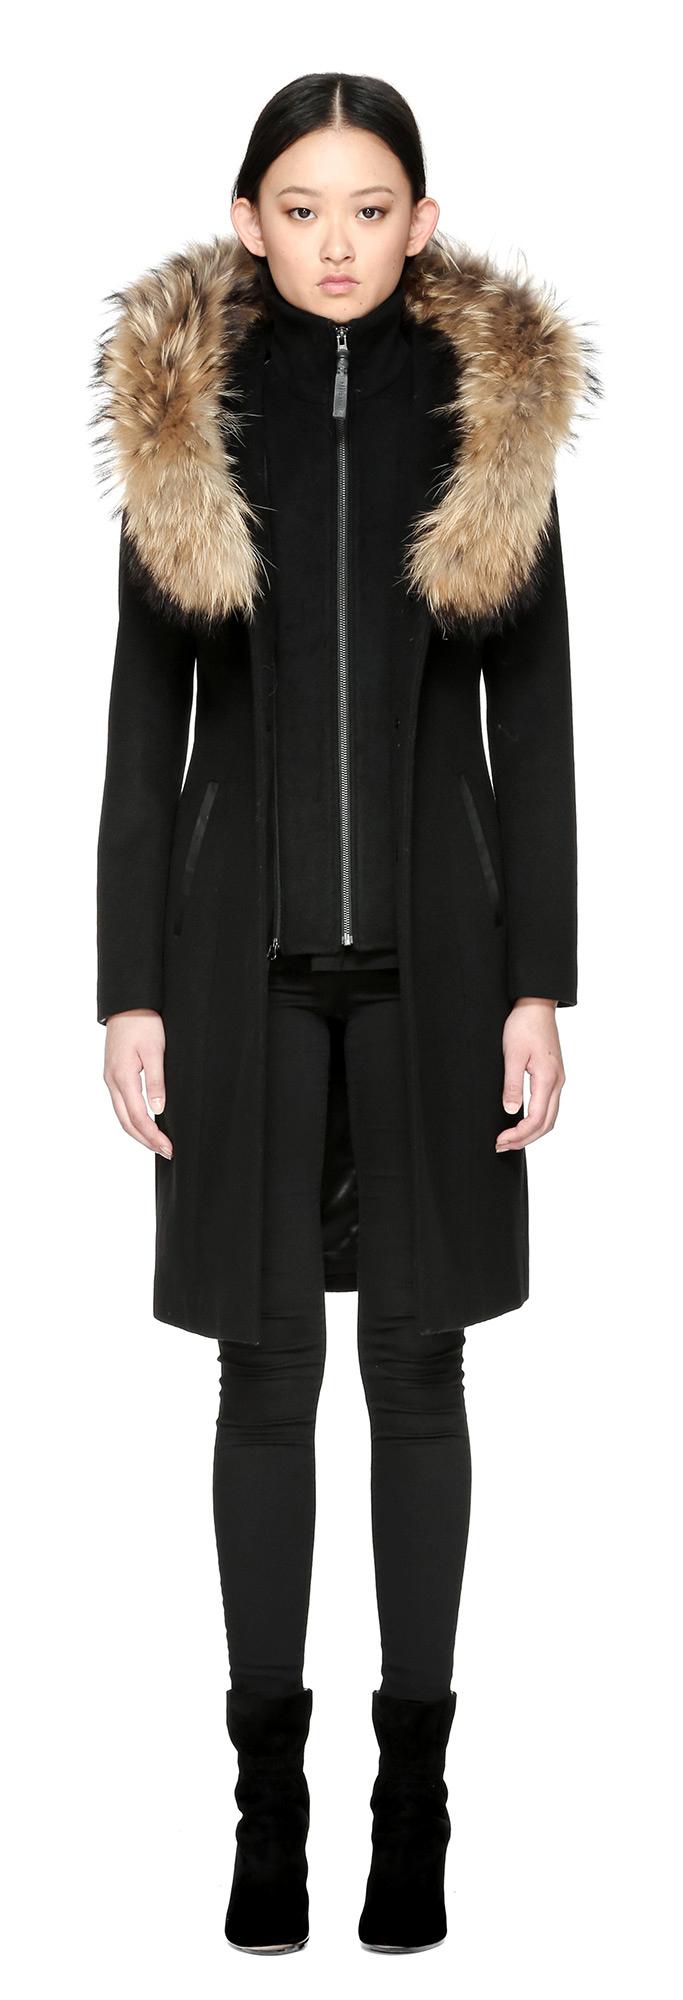 Women's black wool coat with hood – Fashionable jacket 2017 photo blog